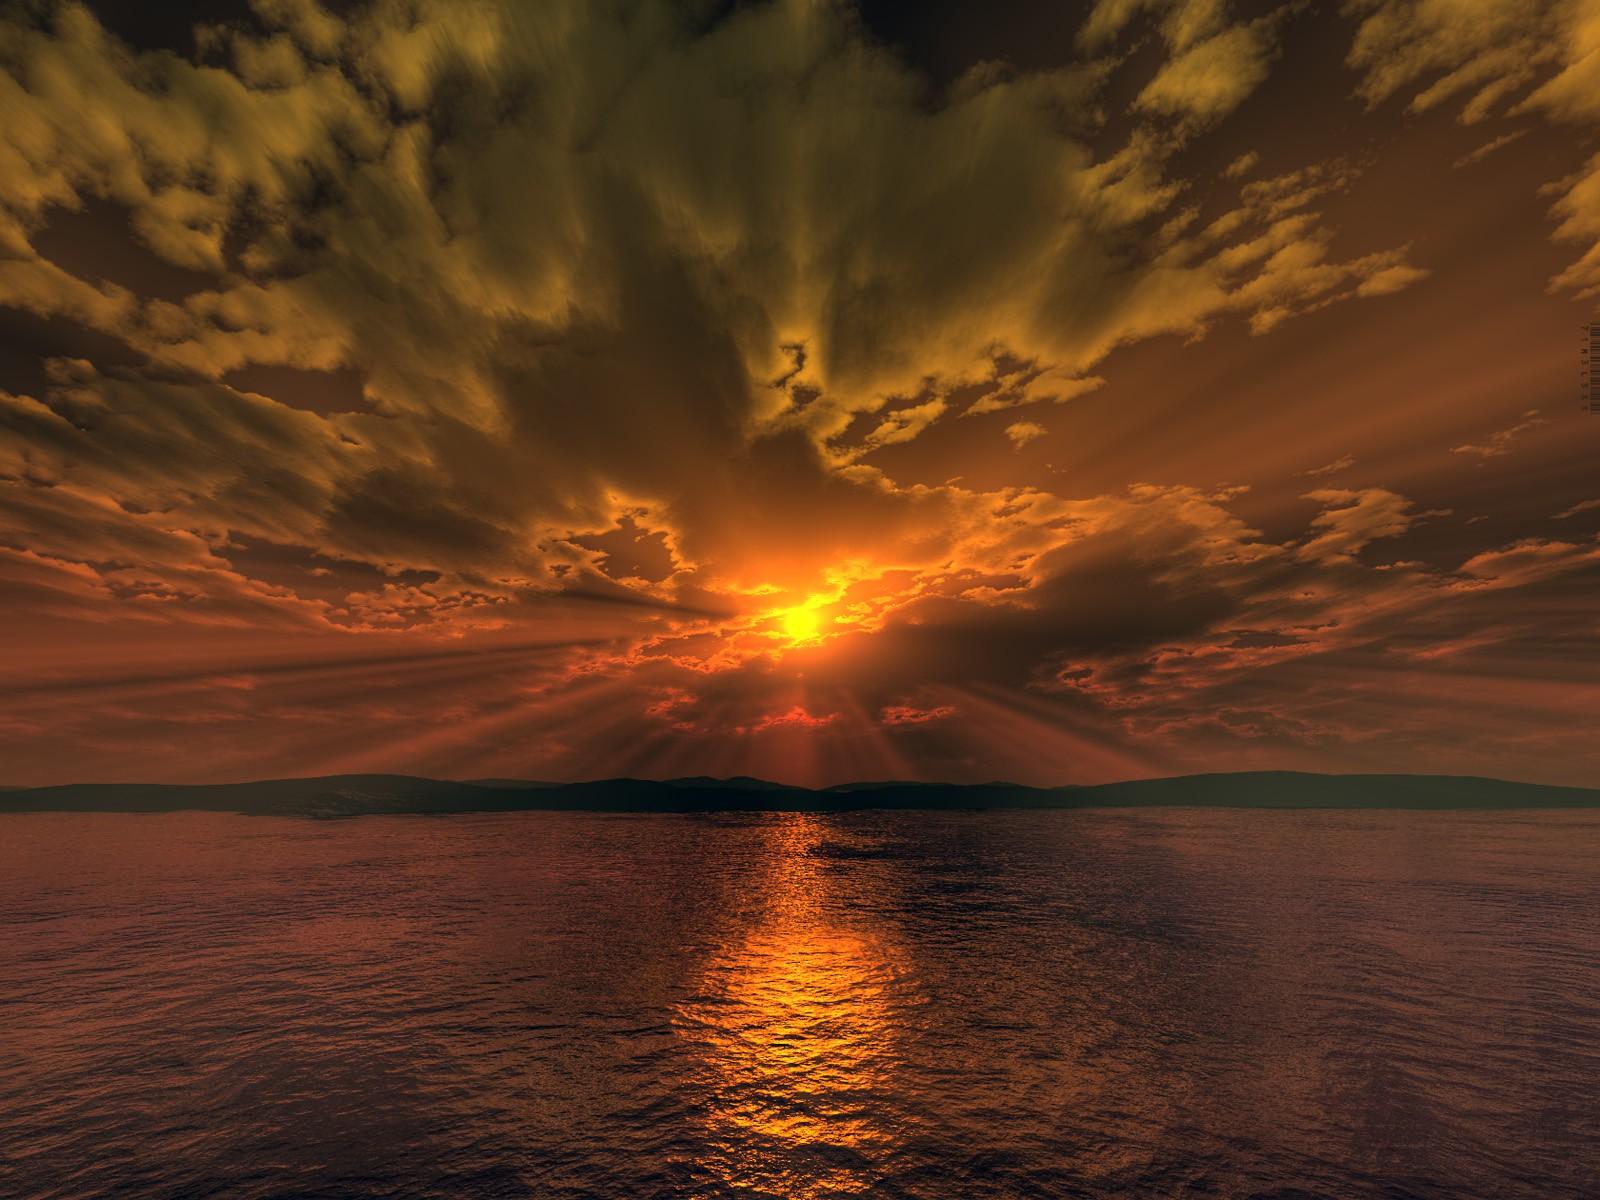 Wallpaper Sinar Matahari Matahari Terbenam Laut 3D